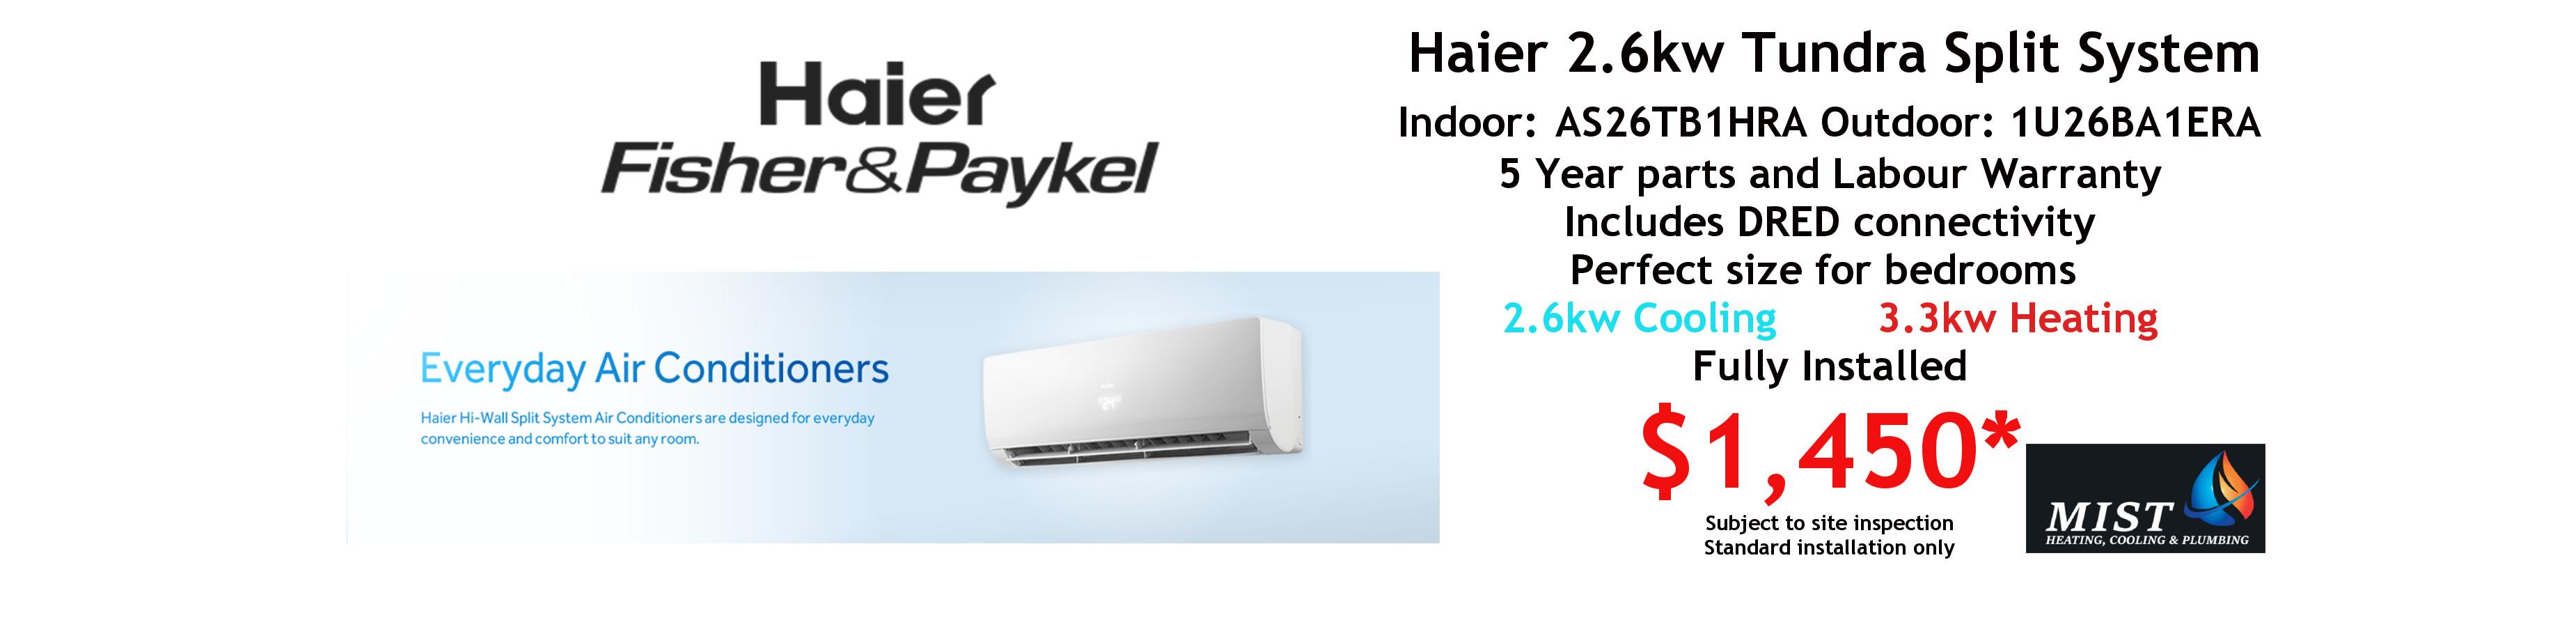 haier 2.6kw split system